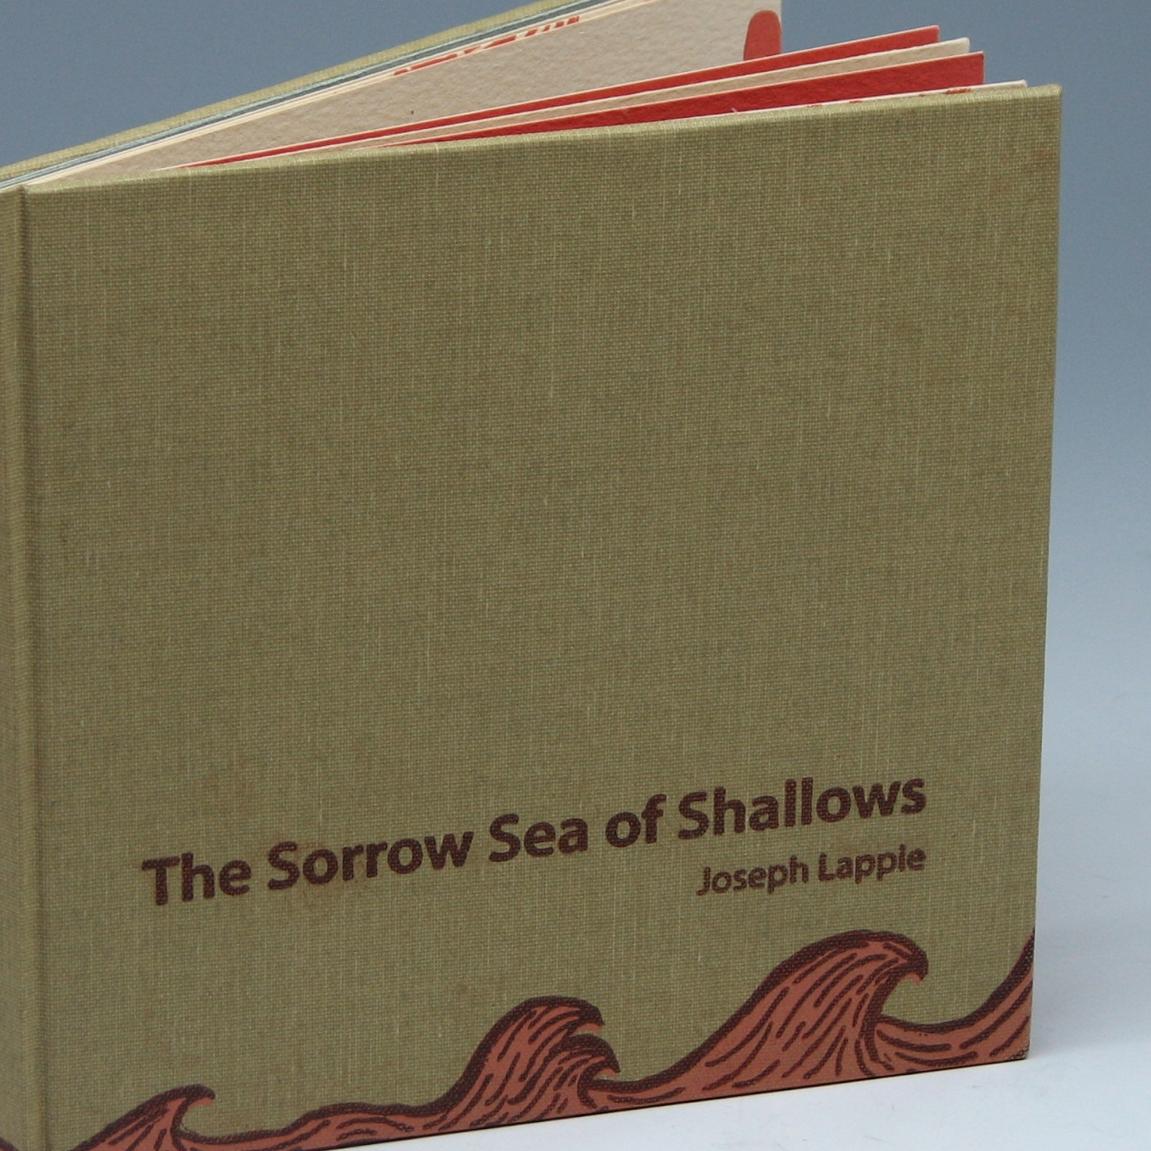 SorrowSeaofShallows01.jpg